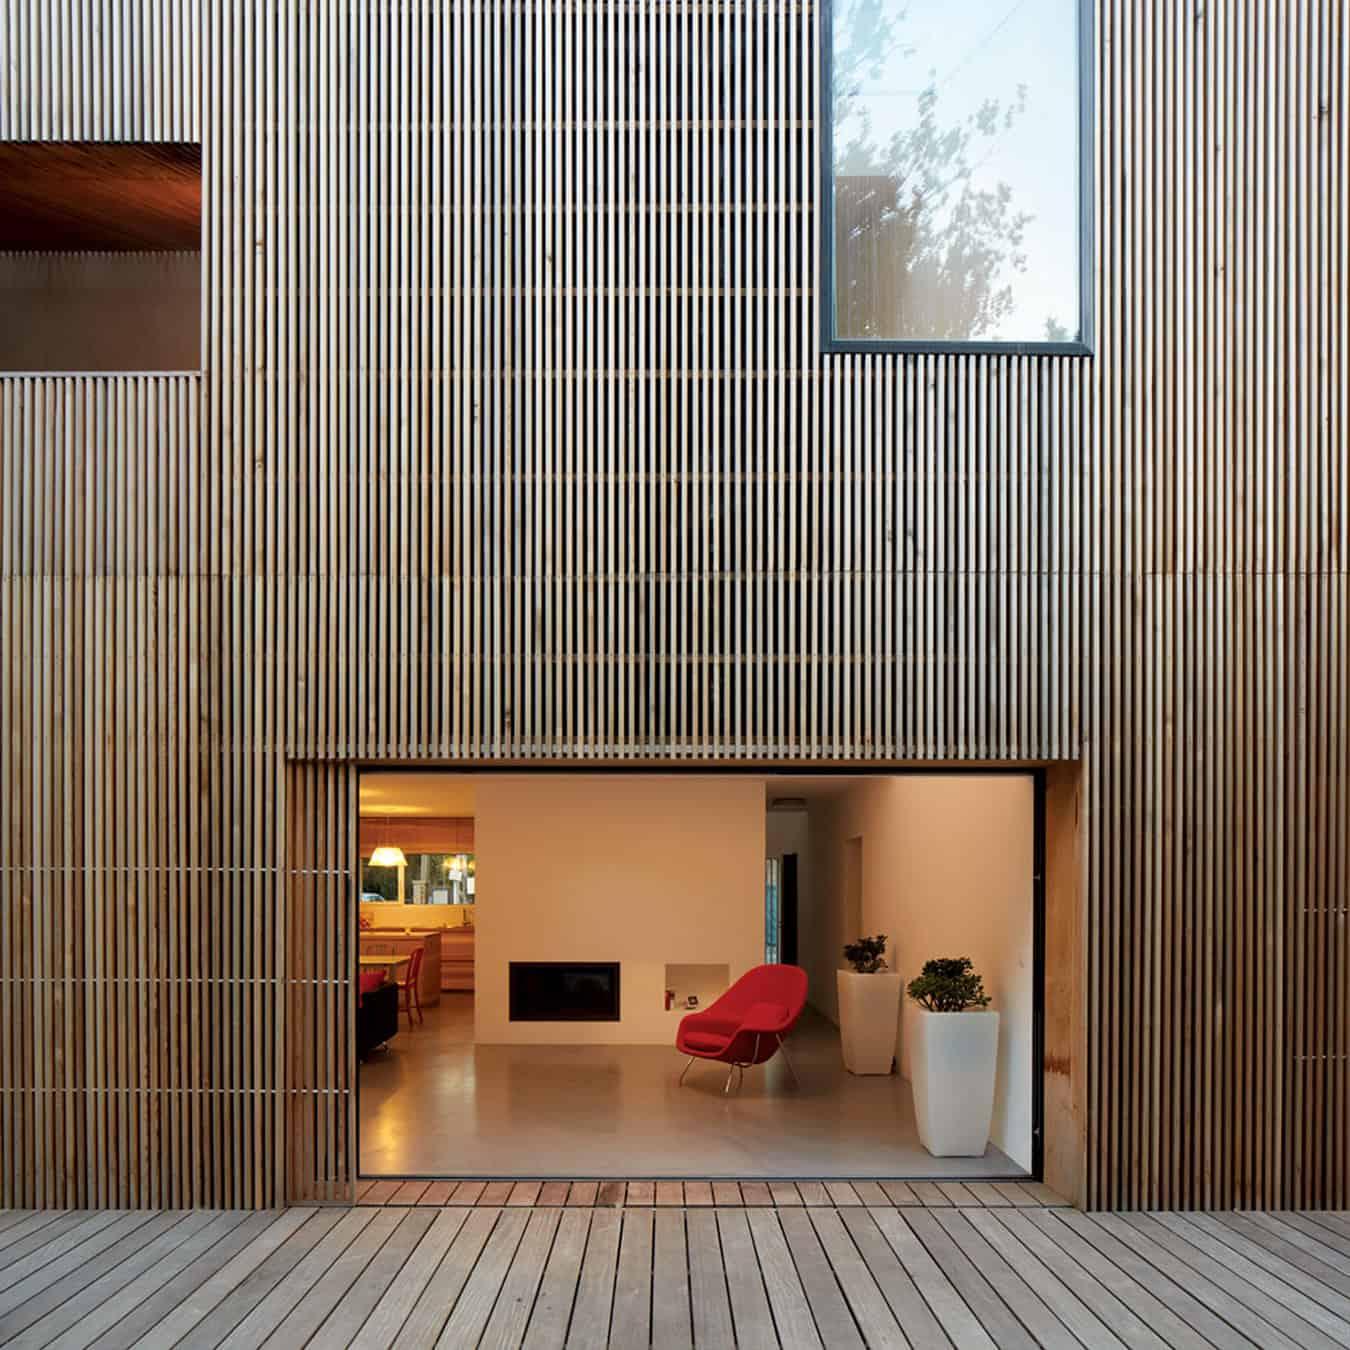 Maison 2G by Avenier Cornejo Architectes (8)